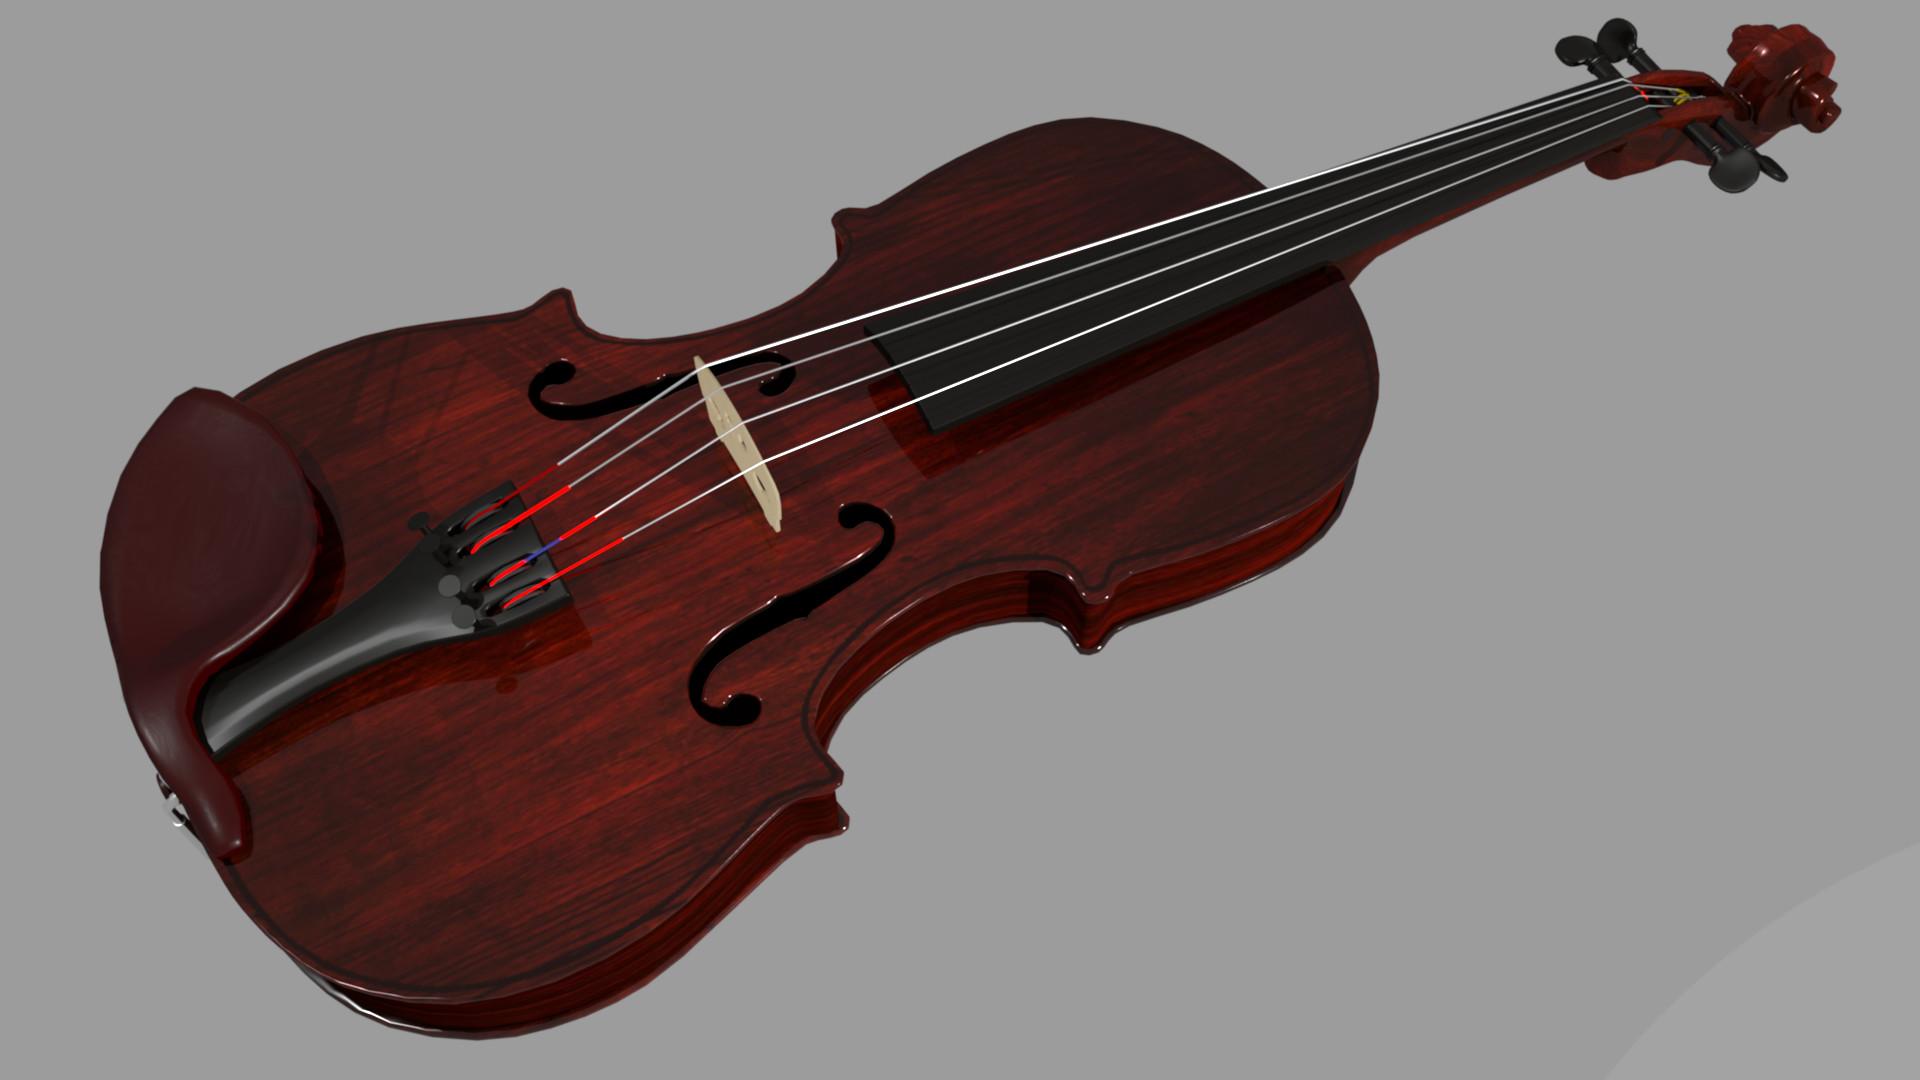 Thomas fraser violin pic1